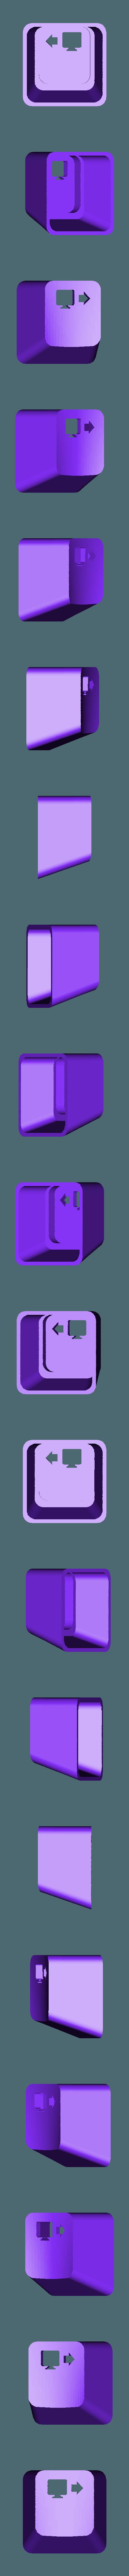 key_SWP.stl Download free STL file Key cap • 3D printing object, MakeItWork